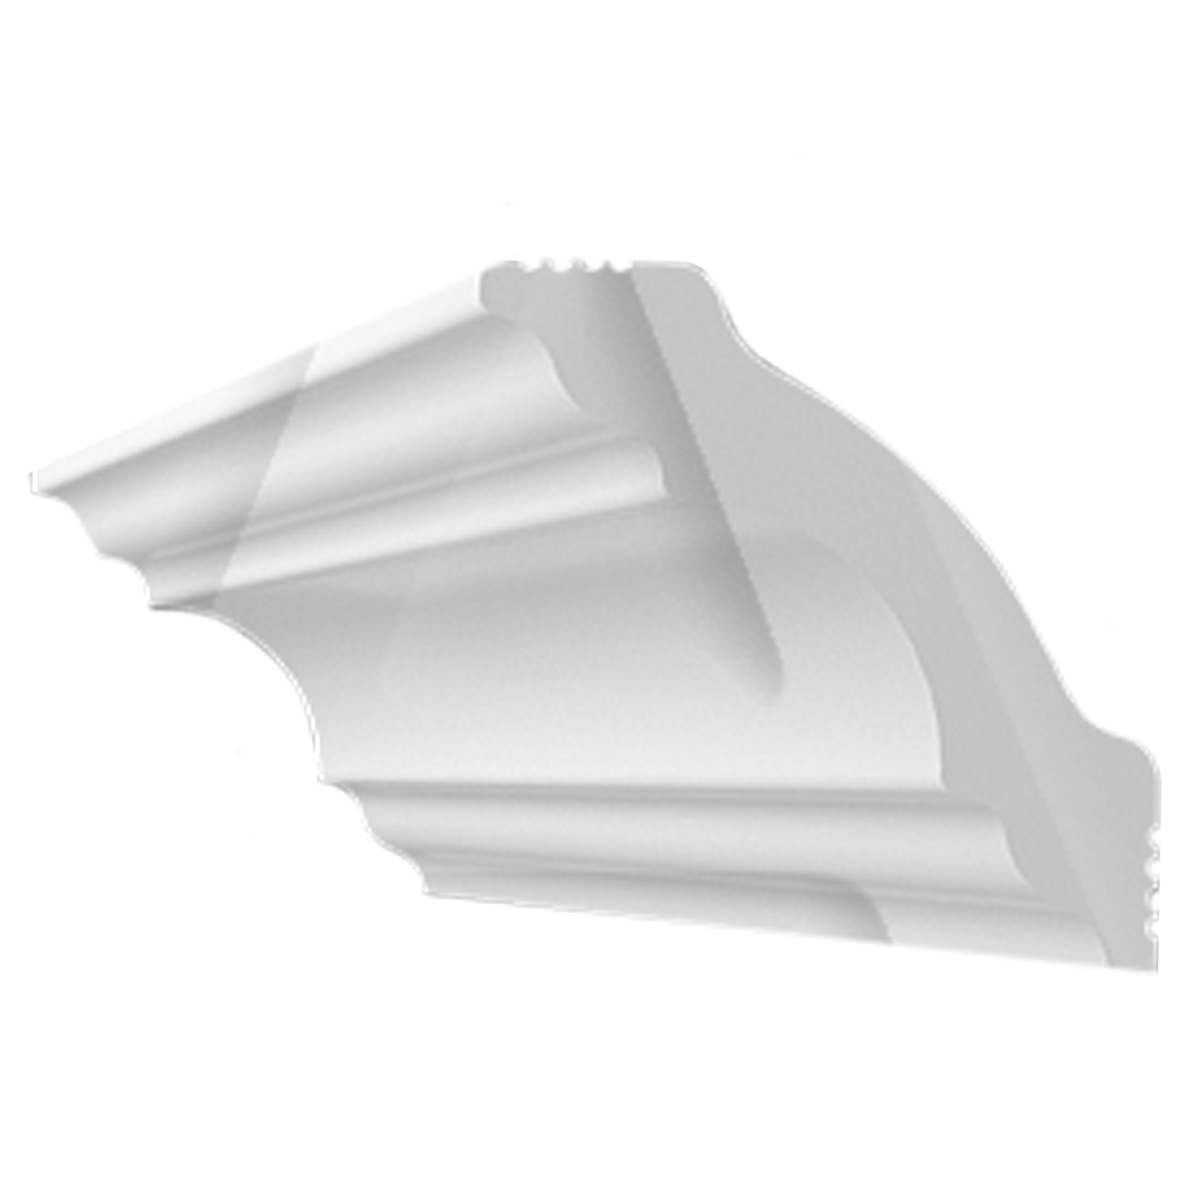 Плинтус из пенополистирола K 50-50 2м Kindecor